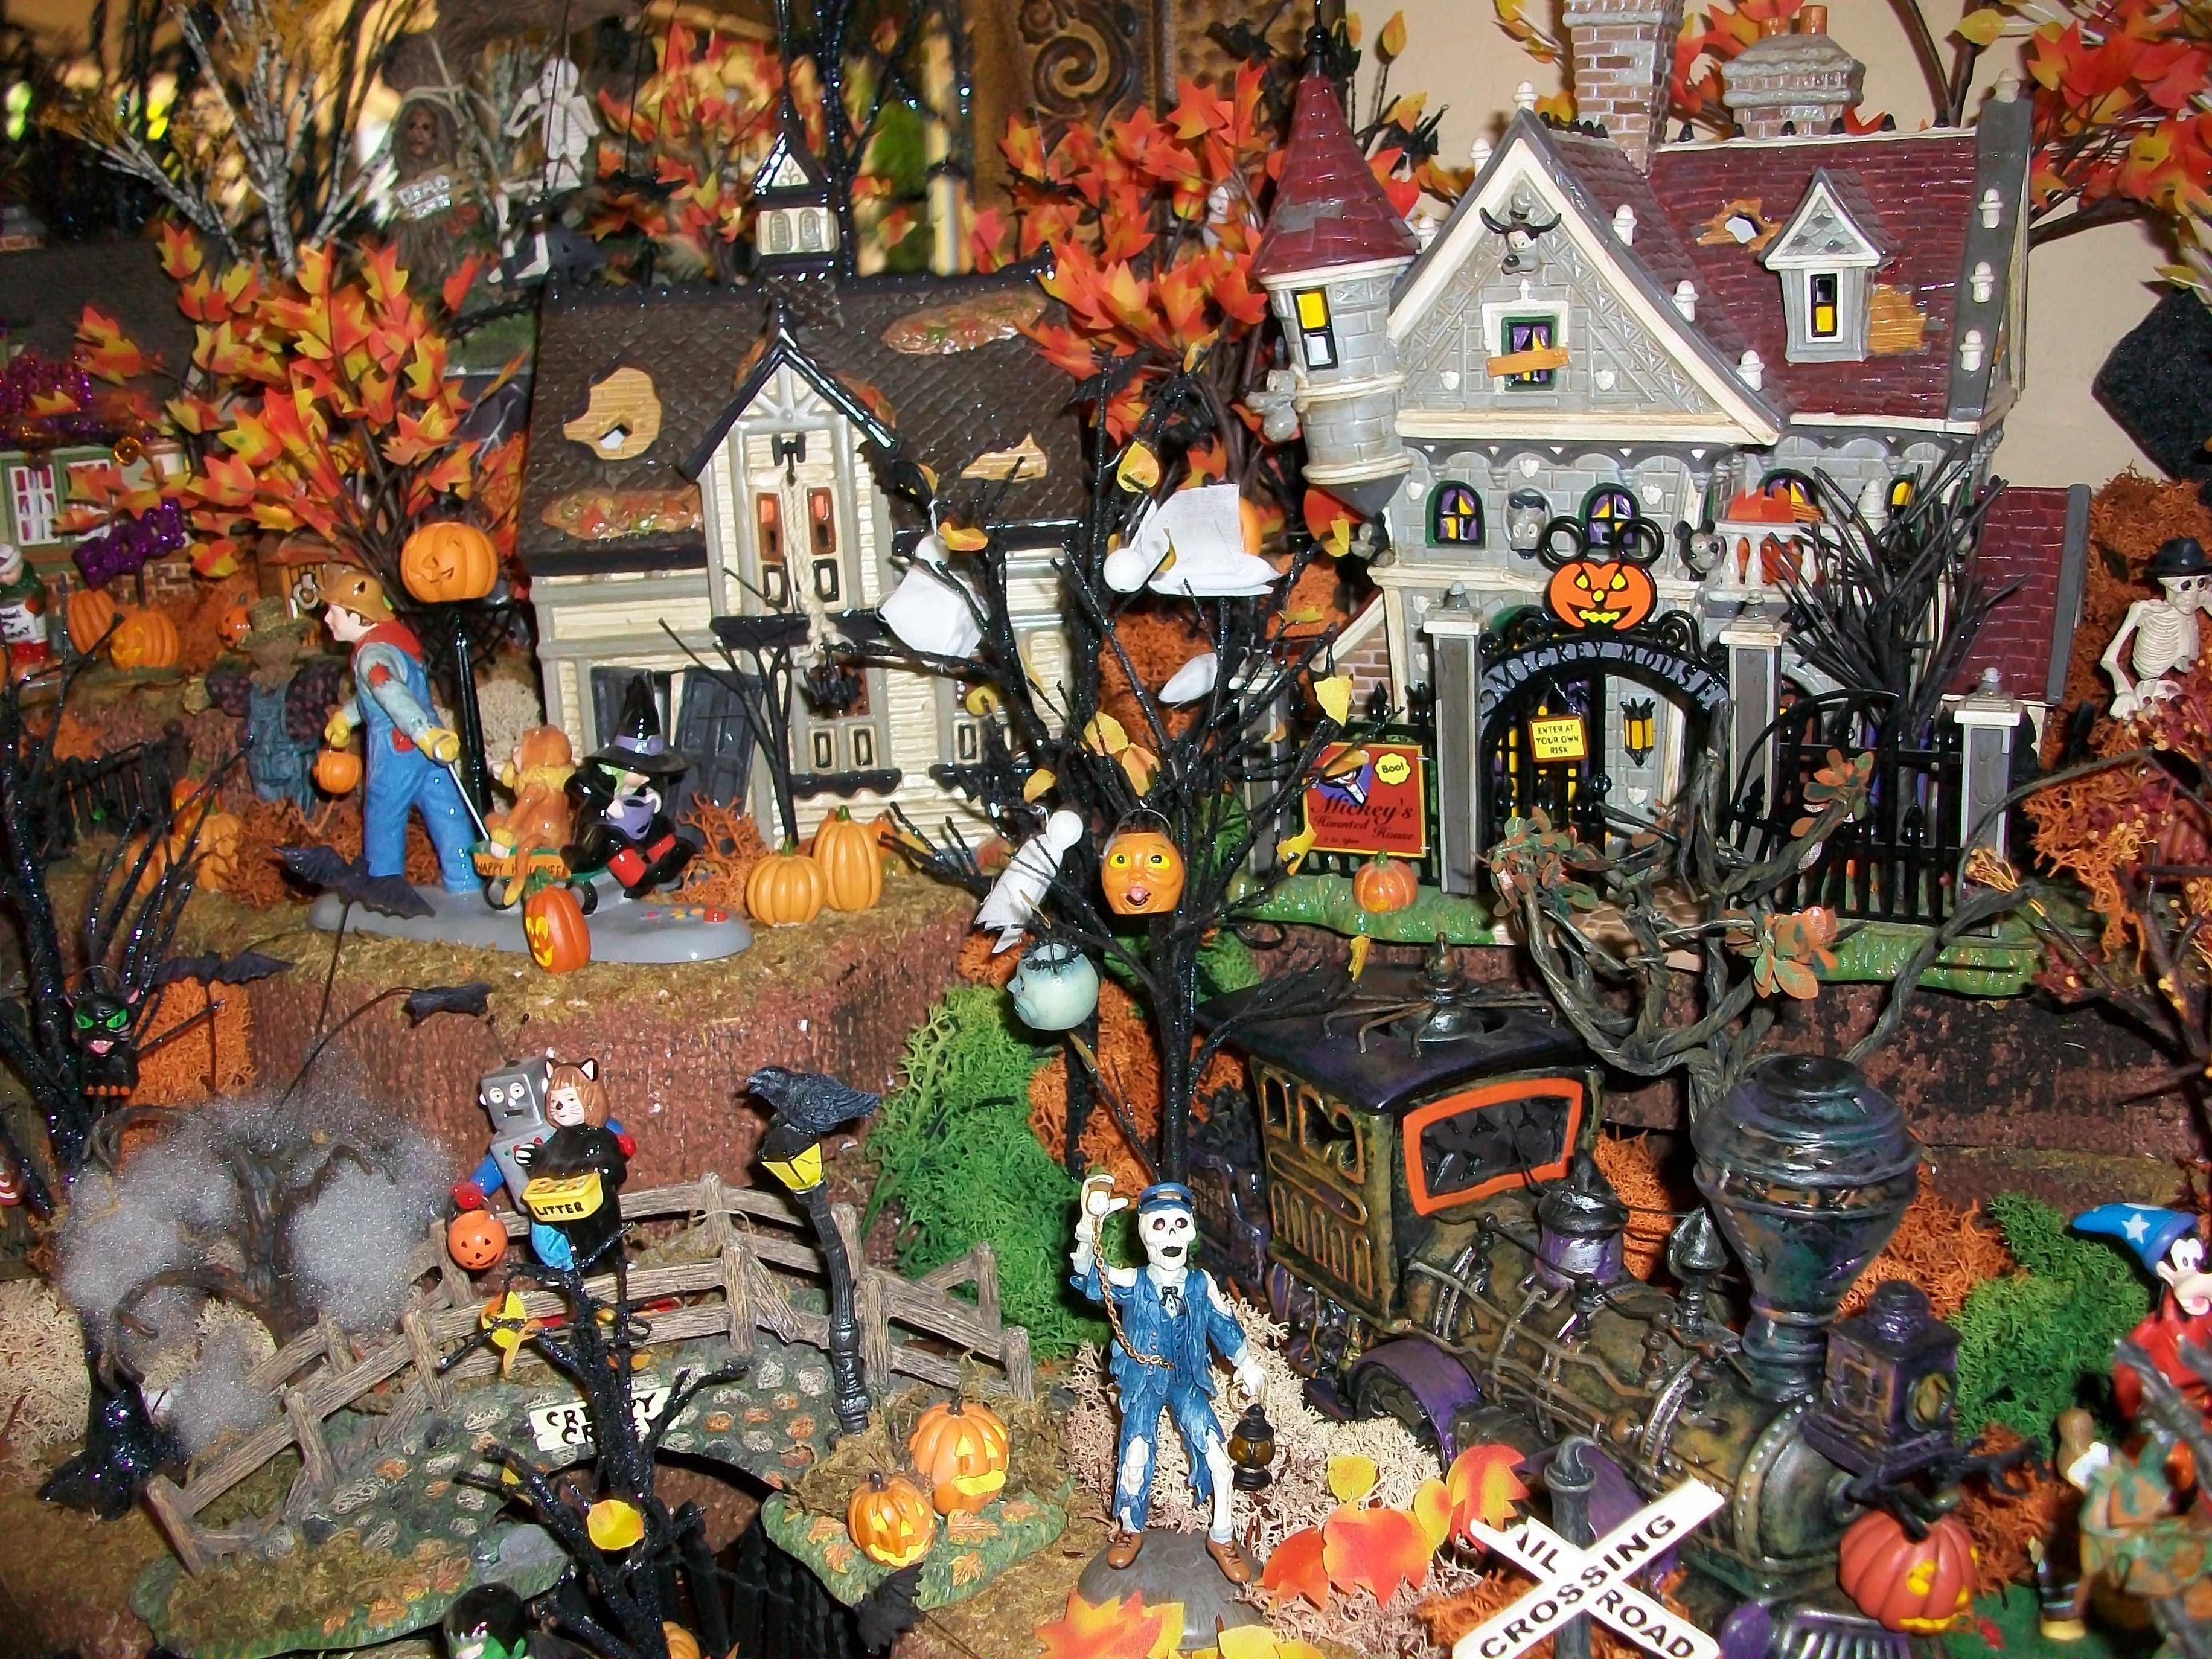 Department 56 dickens village display ideas - Halloween Village Display Dept 56 Halloween Display Lemax Spooky Town Display